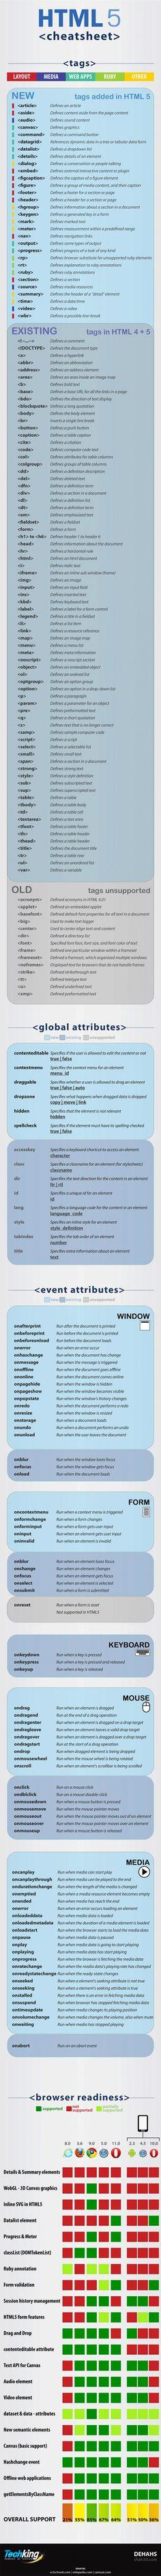 HTML 5 Cheetsheet infographic - found at http://infographipedia.com/ social-media-digital-marketing-html5-cheatsheat-infographic-cosa%C2%AC-non-disturbera%C2%B2-pia%C2%B9-rosati_luca-chiedendogli-dettagli-in-merito.html